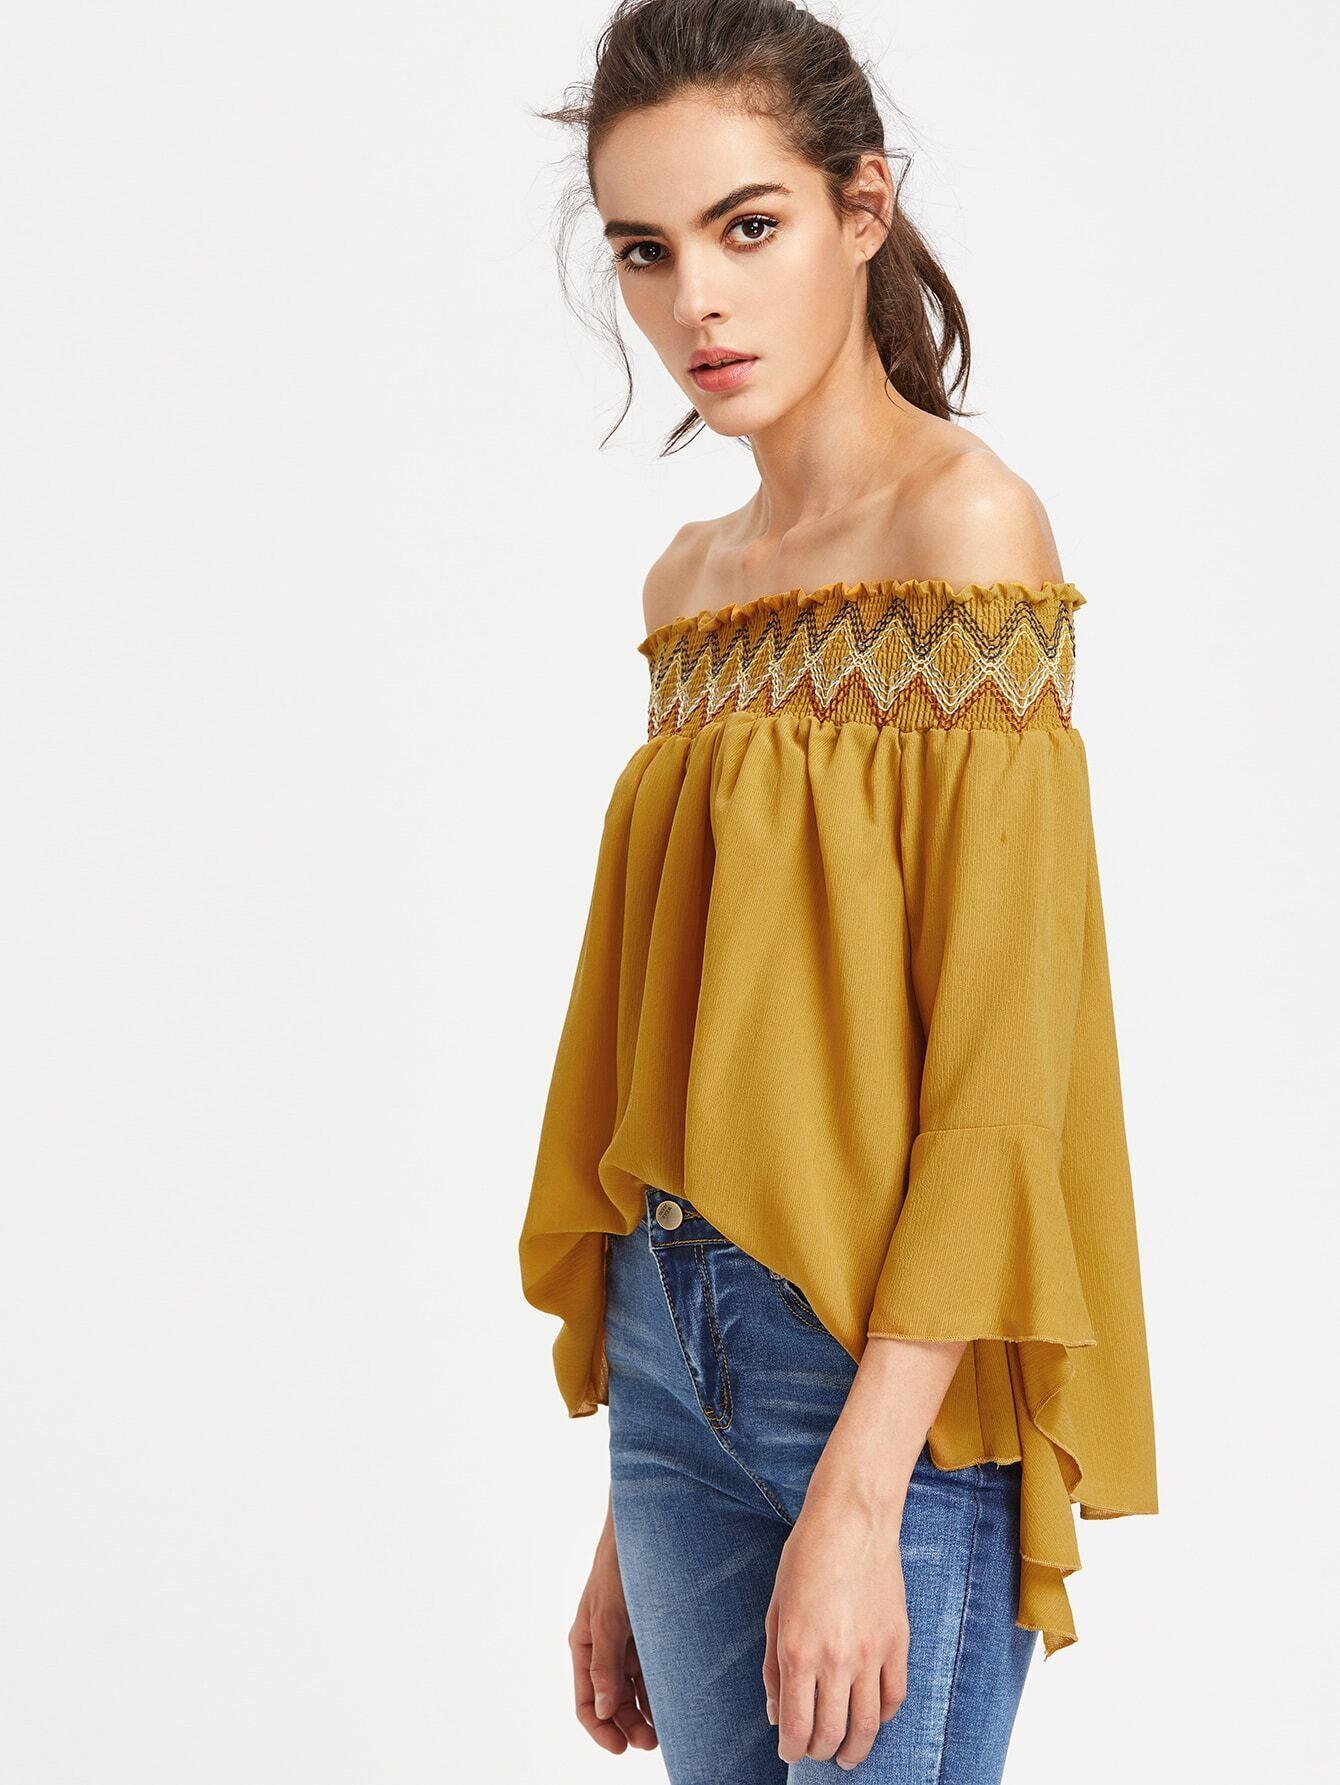 blouse170503106_2